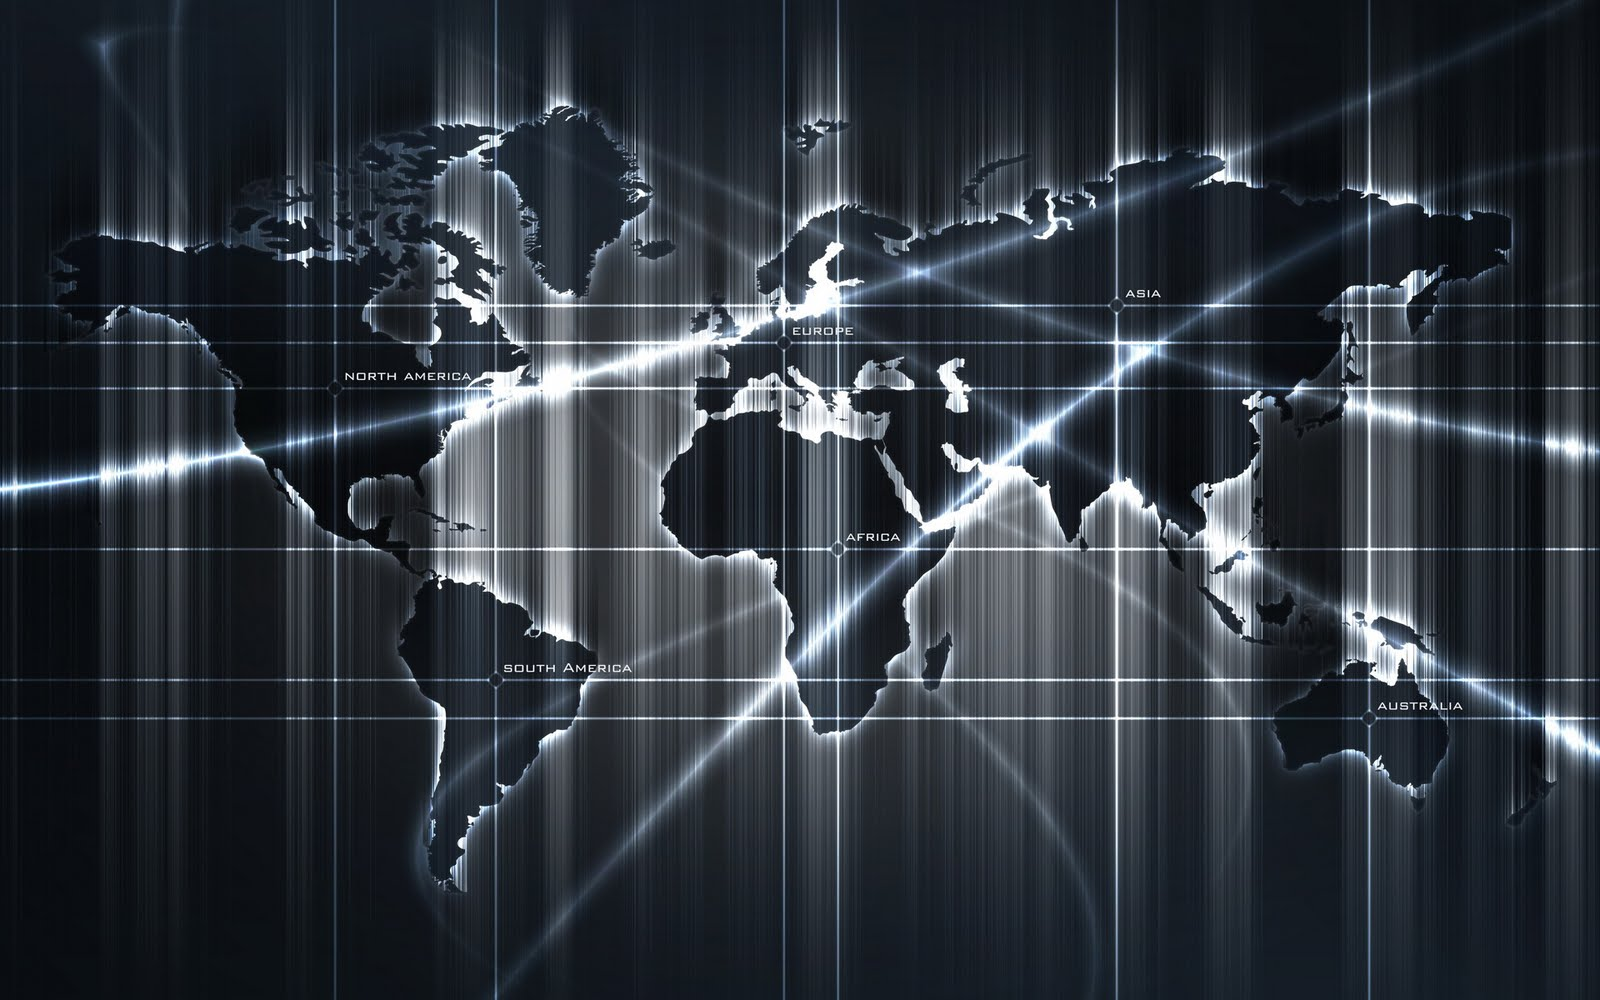 http://4.bp.blogspot.com/-9MiCLYHDcBs/USif7EbNHiI/AAAAAAAAQkQ/7vg7GyLn2sU/s1600/mapa-mundi-em-tons-escuros-imagens-imagem-de-fundo-wallpaper-para-pc-computador-tela-gratis-ambiente-de-trabalho.jpg